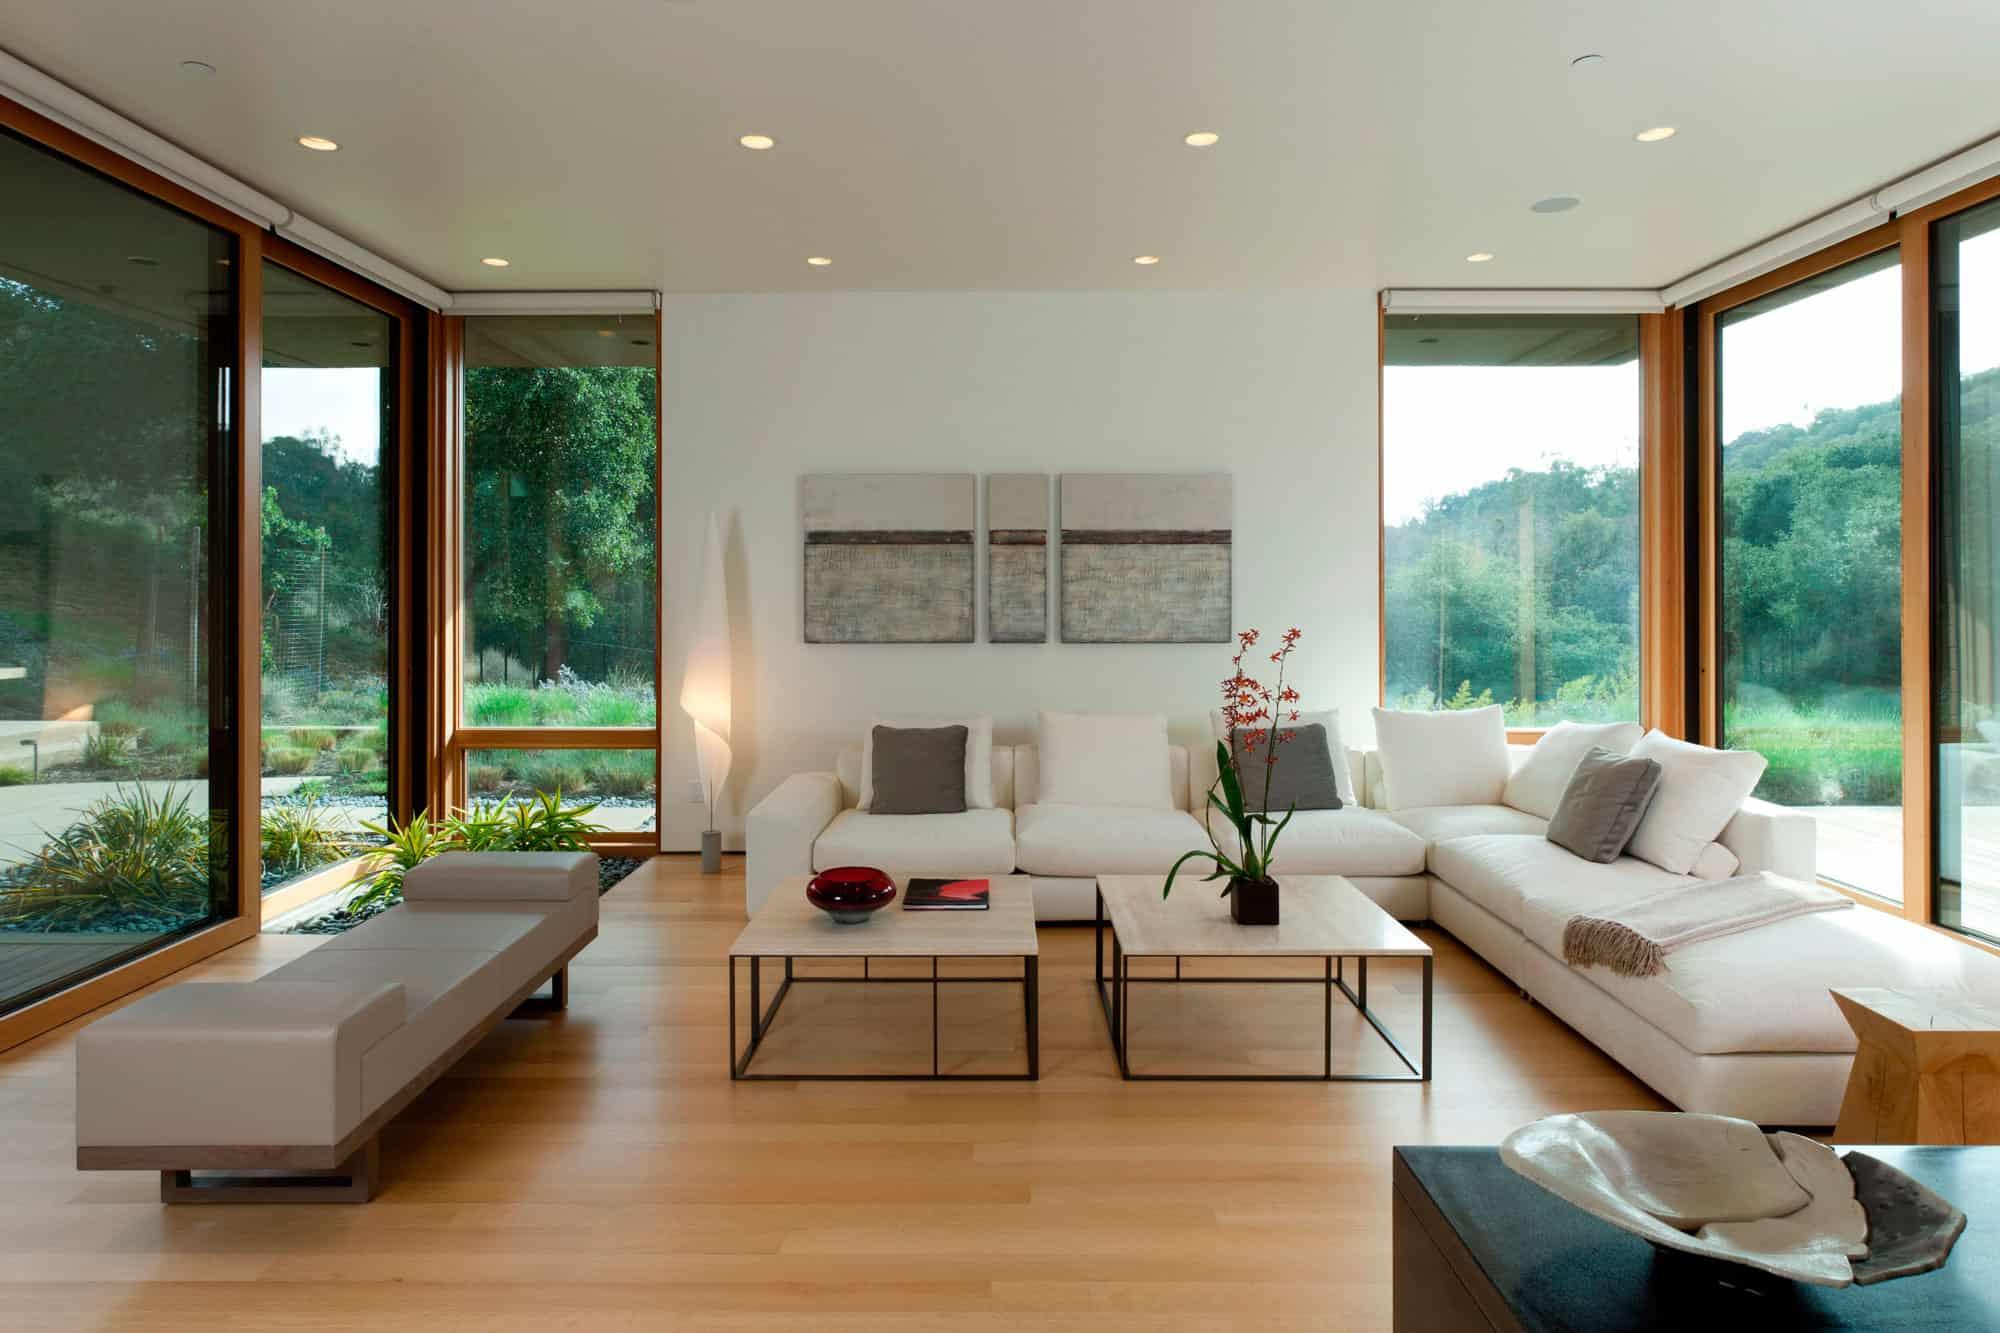 Sinbad Creek Residence by Swatt Miers Architects